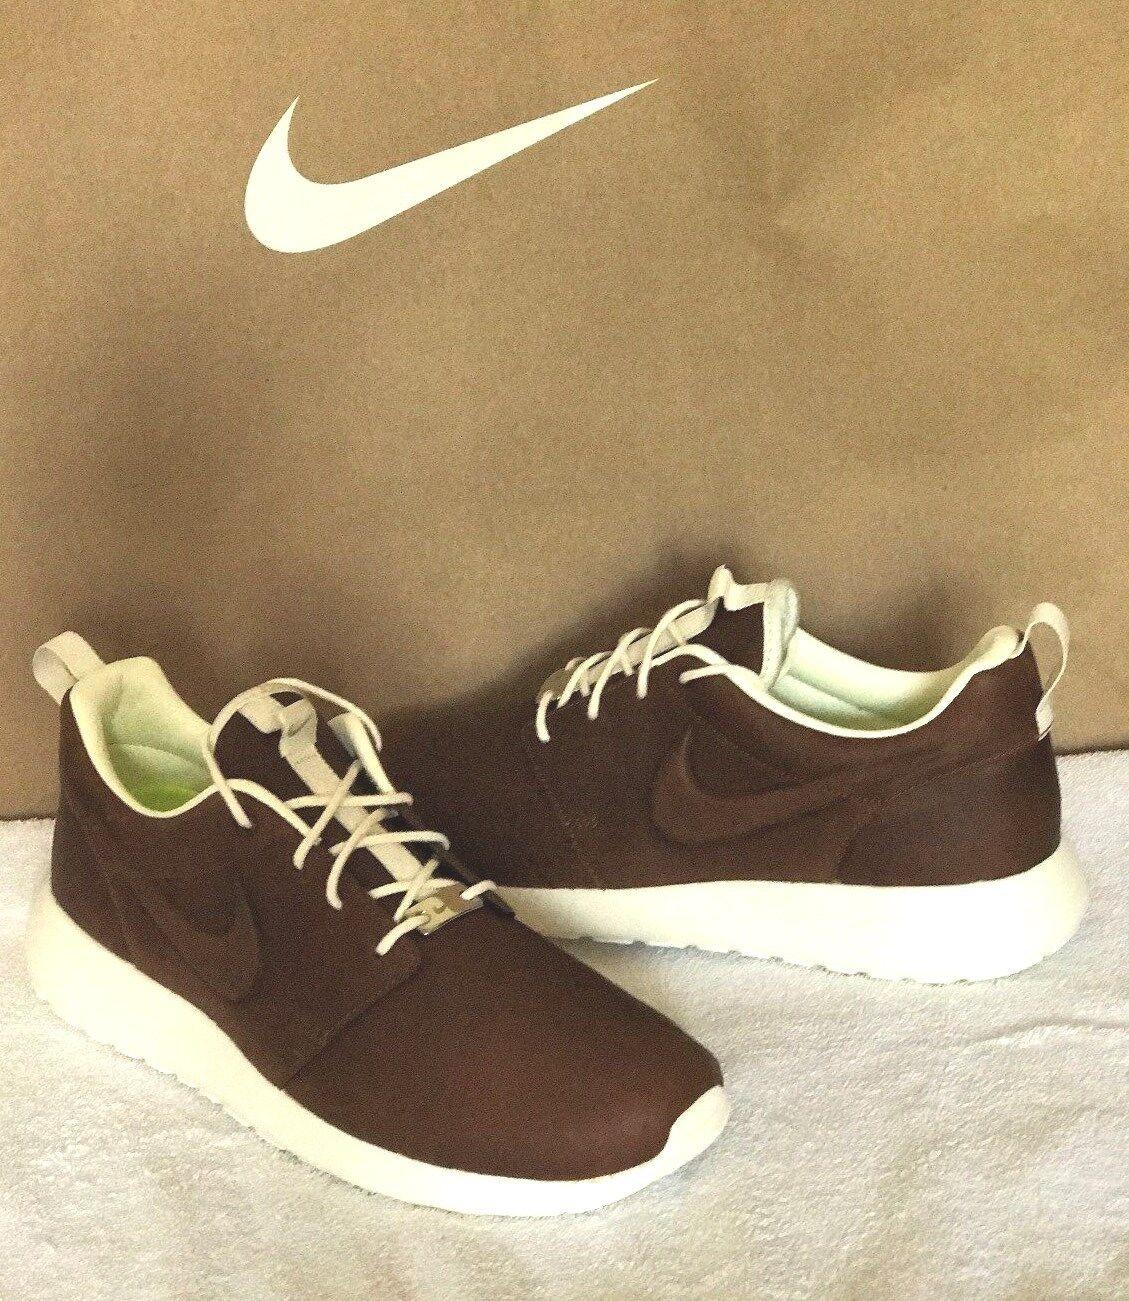 Nike Roshe Running Shoe iD Premium Leather Brown - White Size 6.5